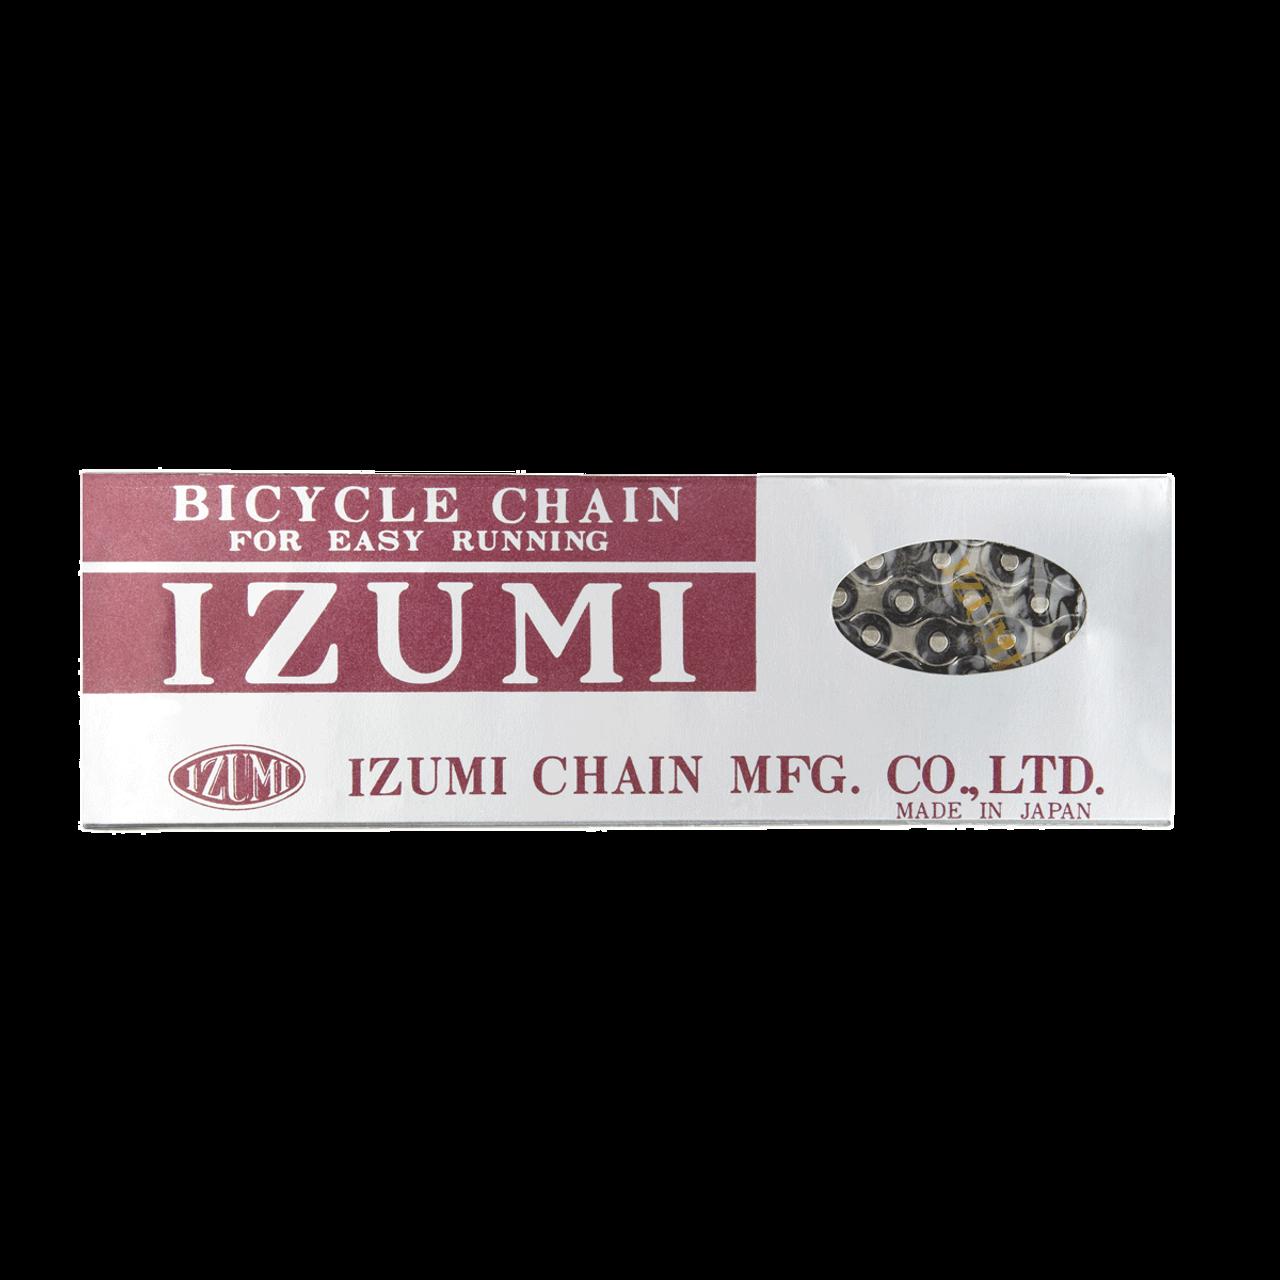 Izumi Standard Chain 1/2 X 116 Links In Silver/Black